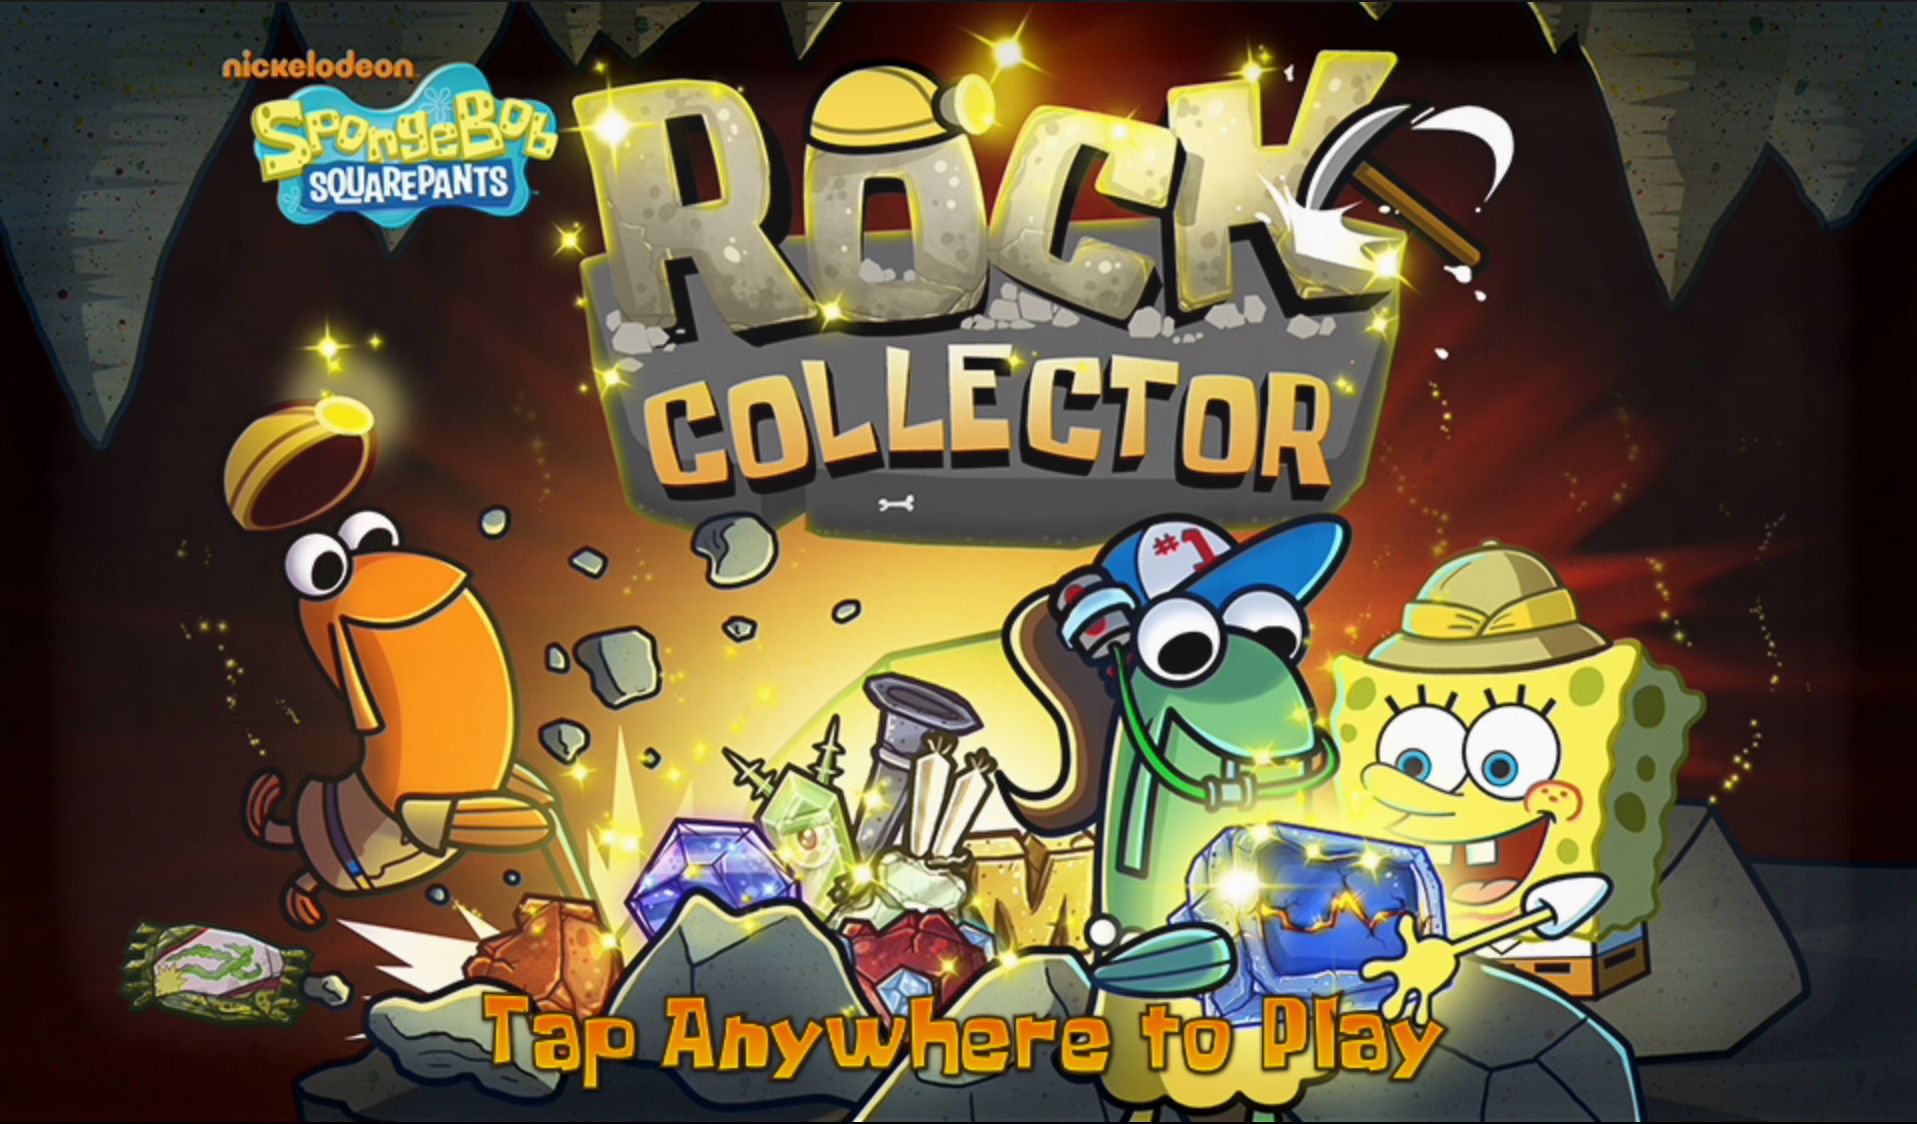 Spongebob Squarepants: Rock Collector